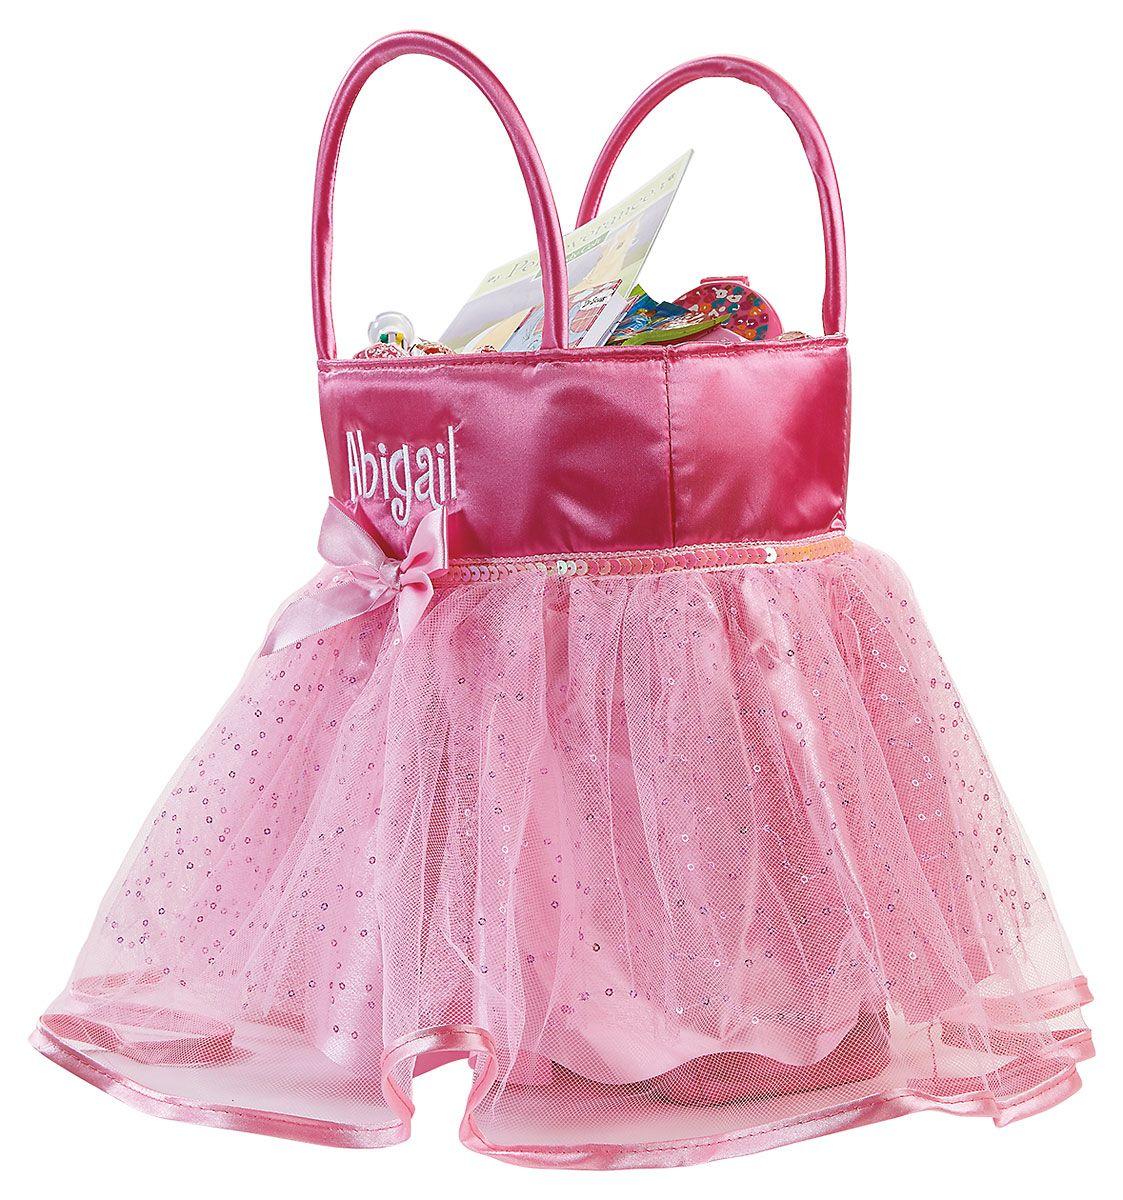 Personalized Tutu Treat Basket